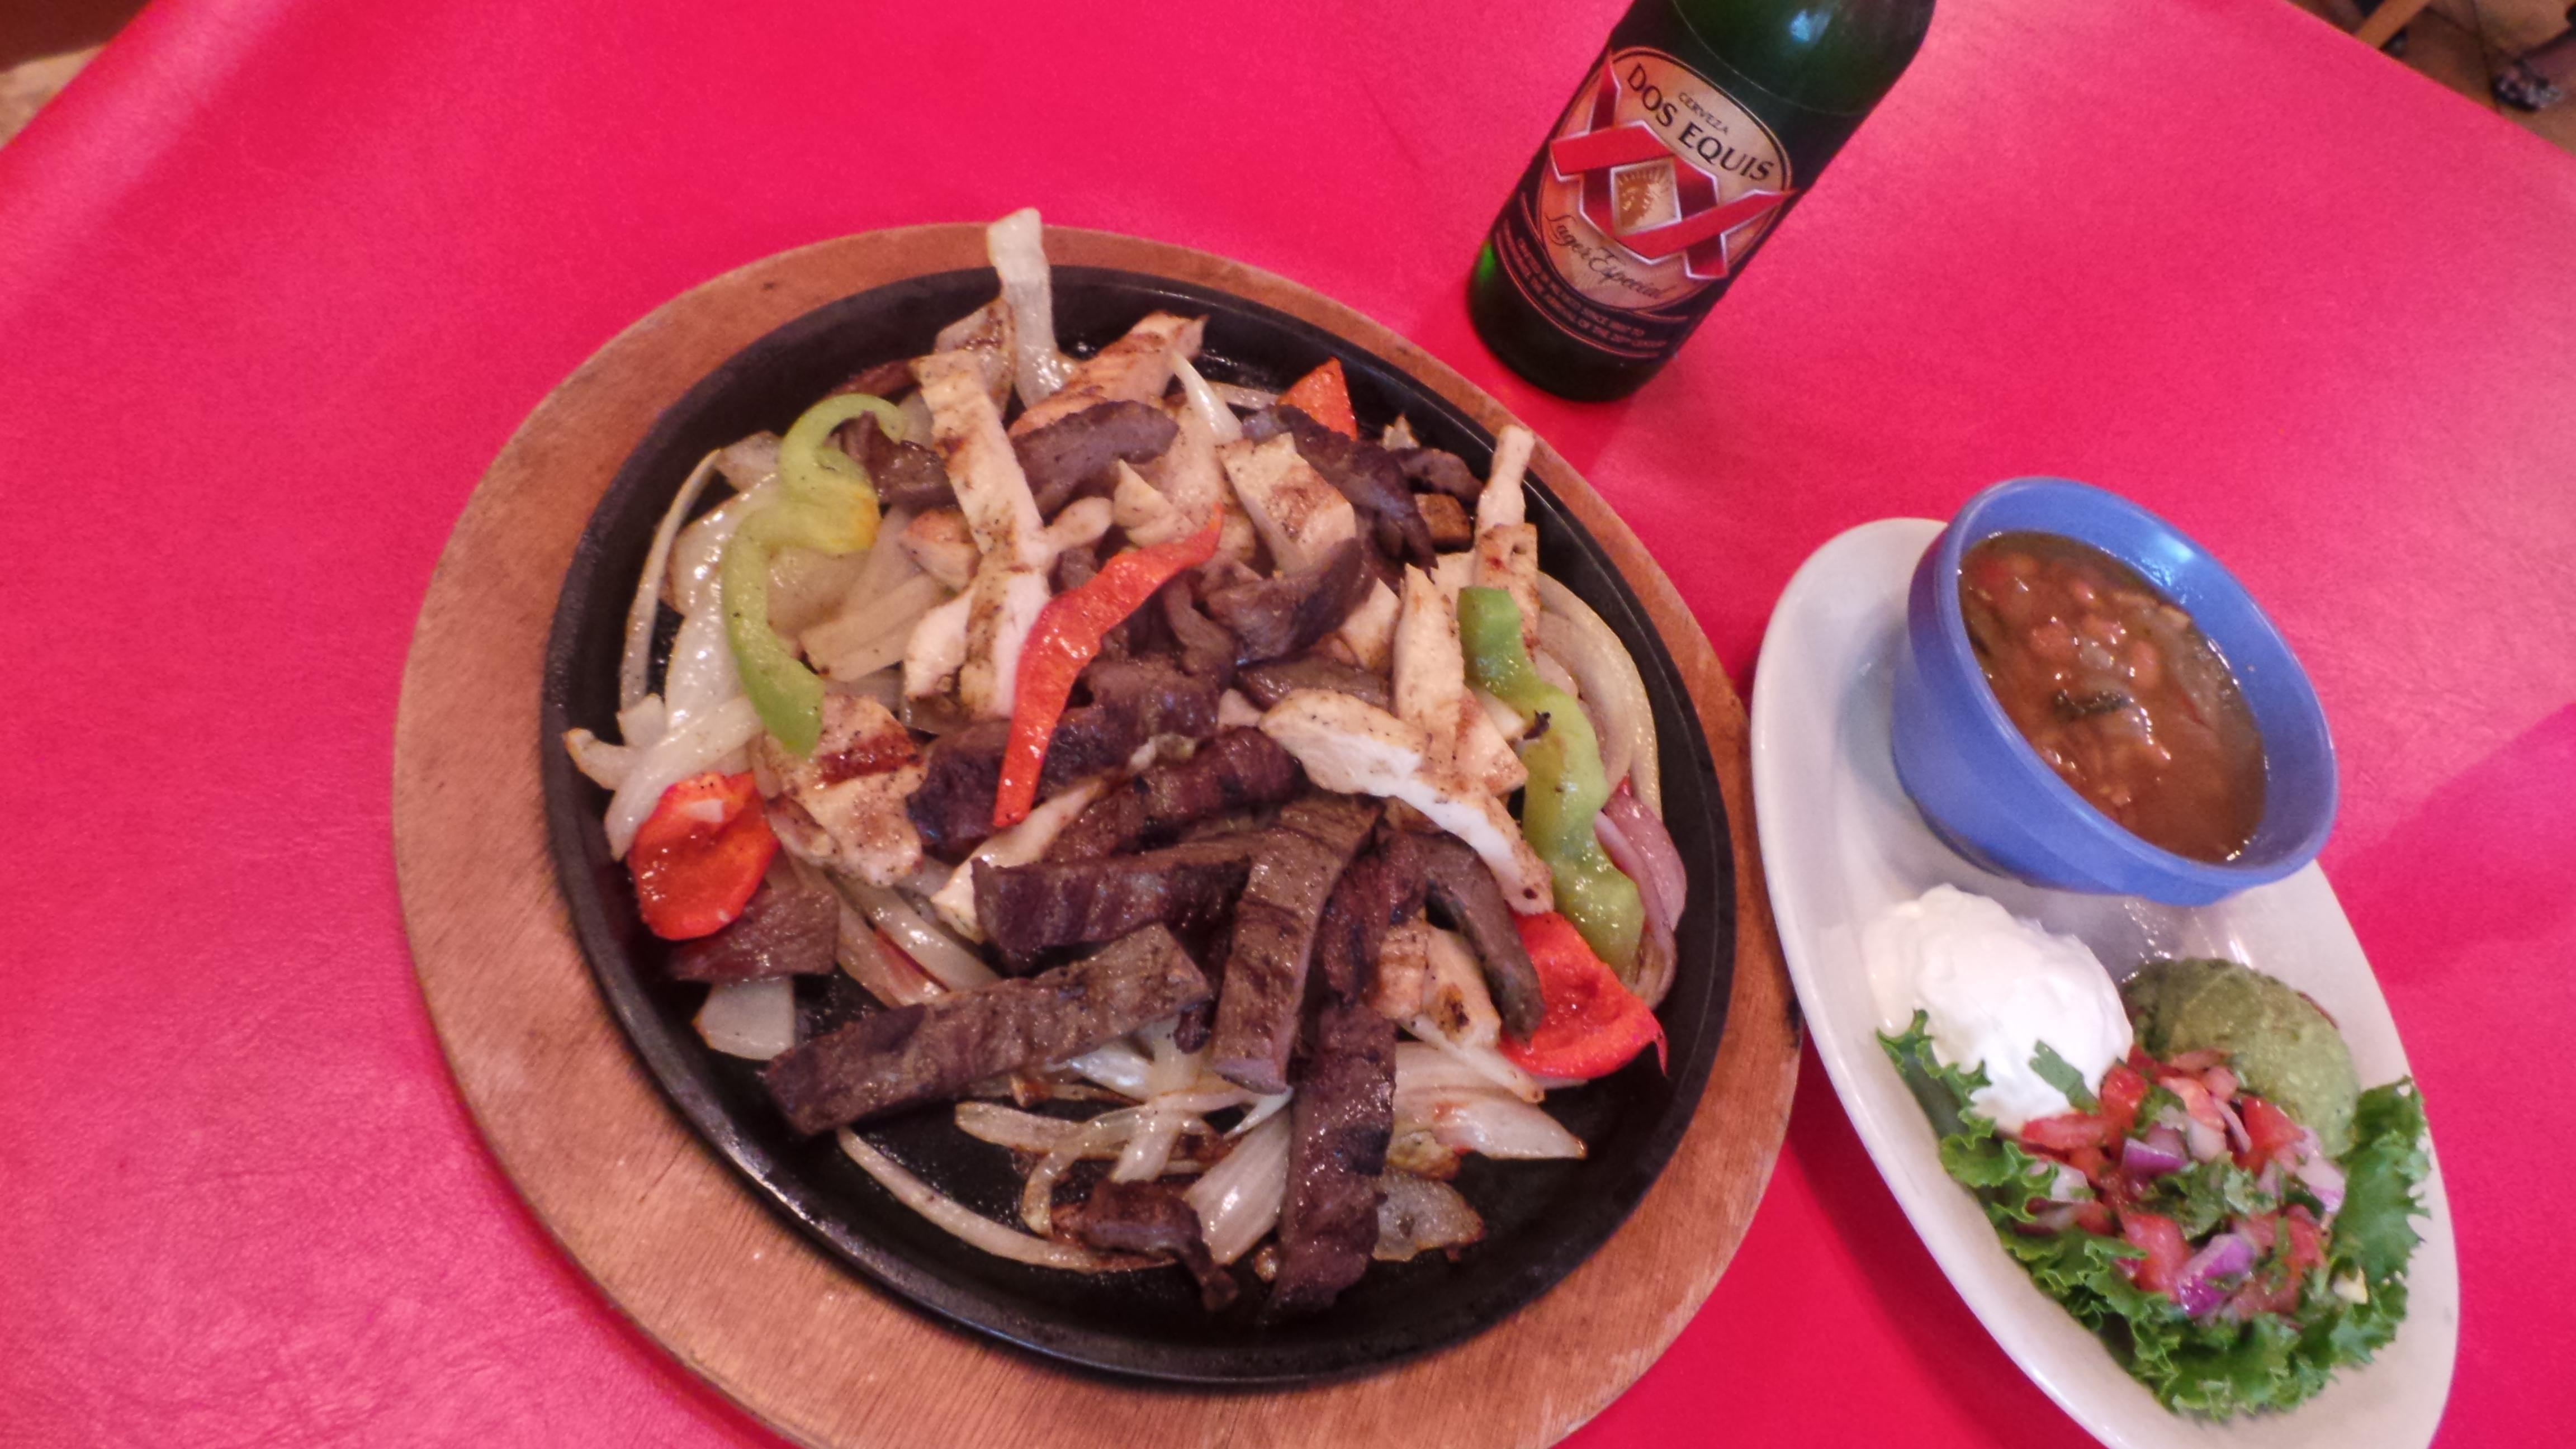 Sabor A La Mexicana Restaurant image 5